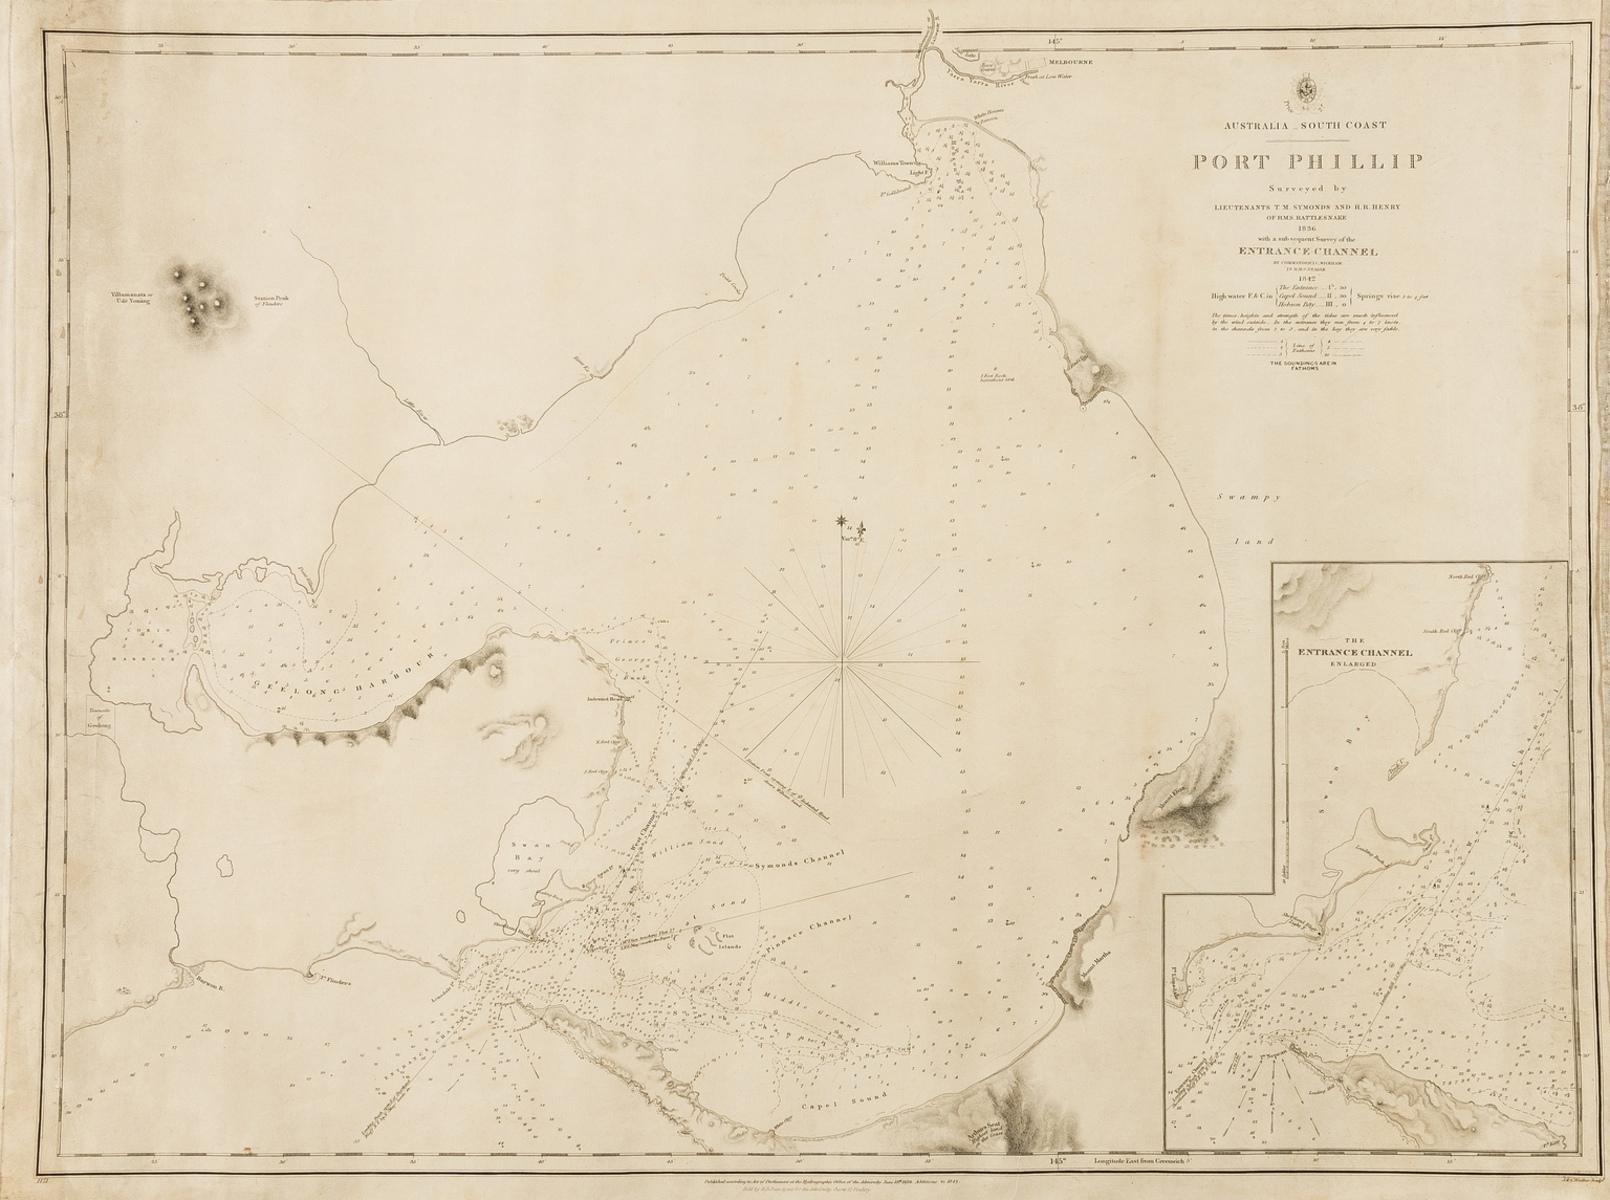 Australia.- Hydrographic Office of the Admirality (British) Australia South Coast - Port Phillip, …